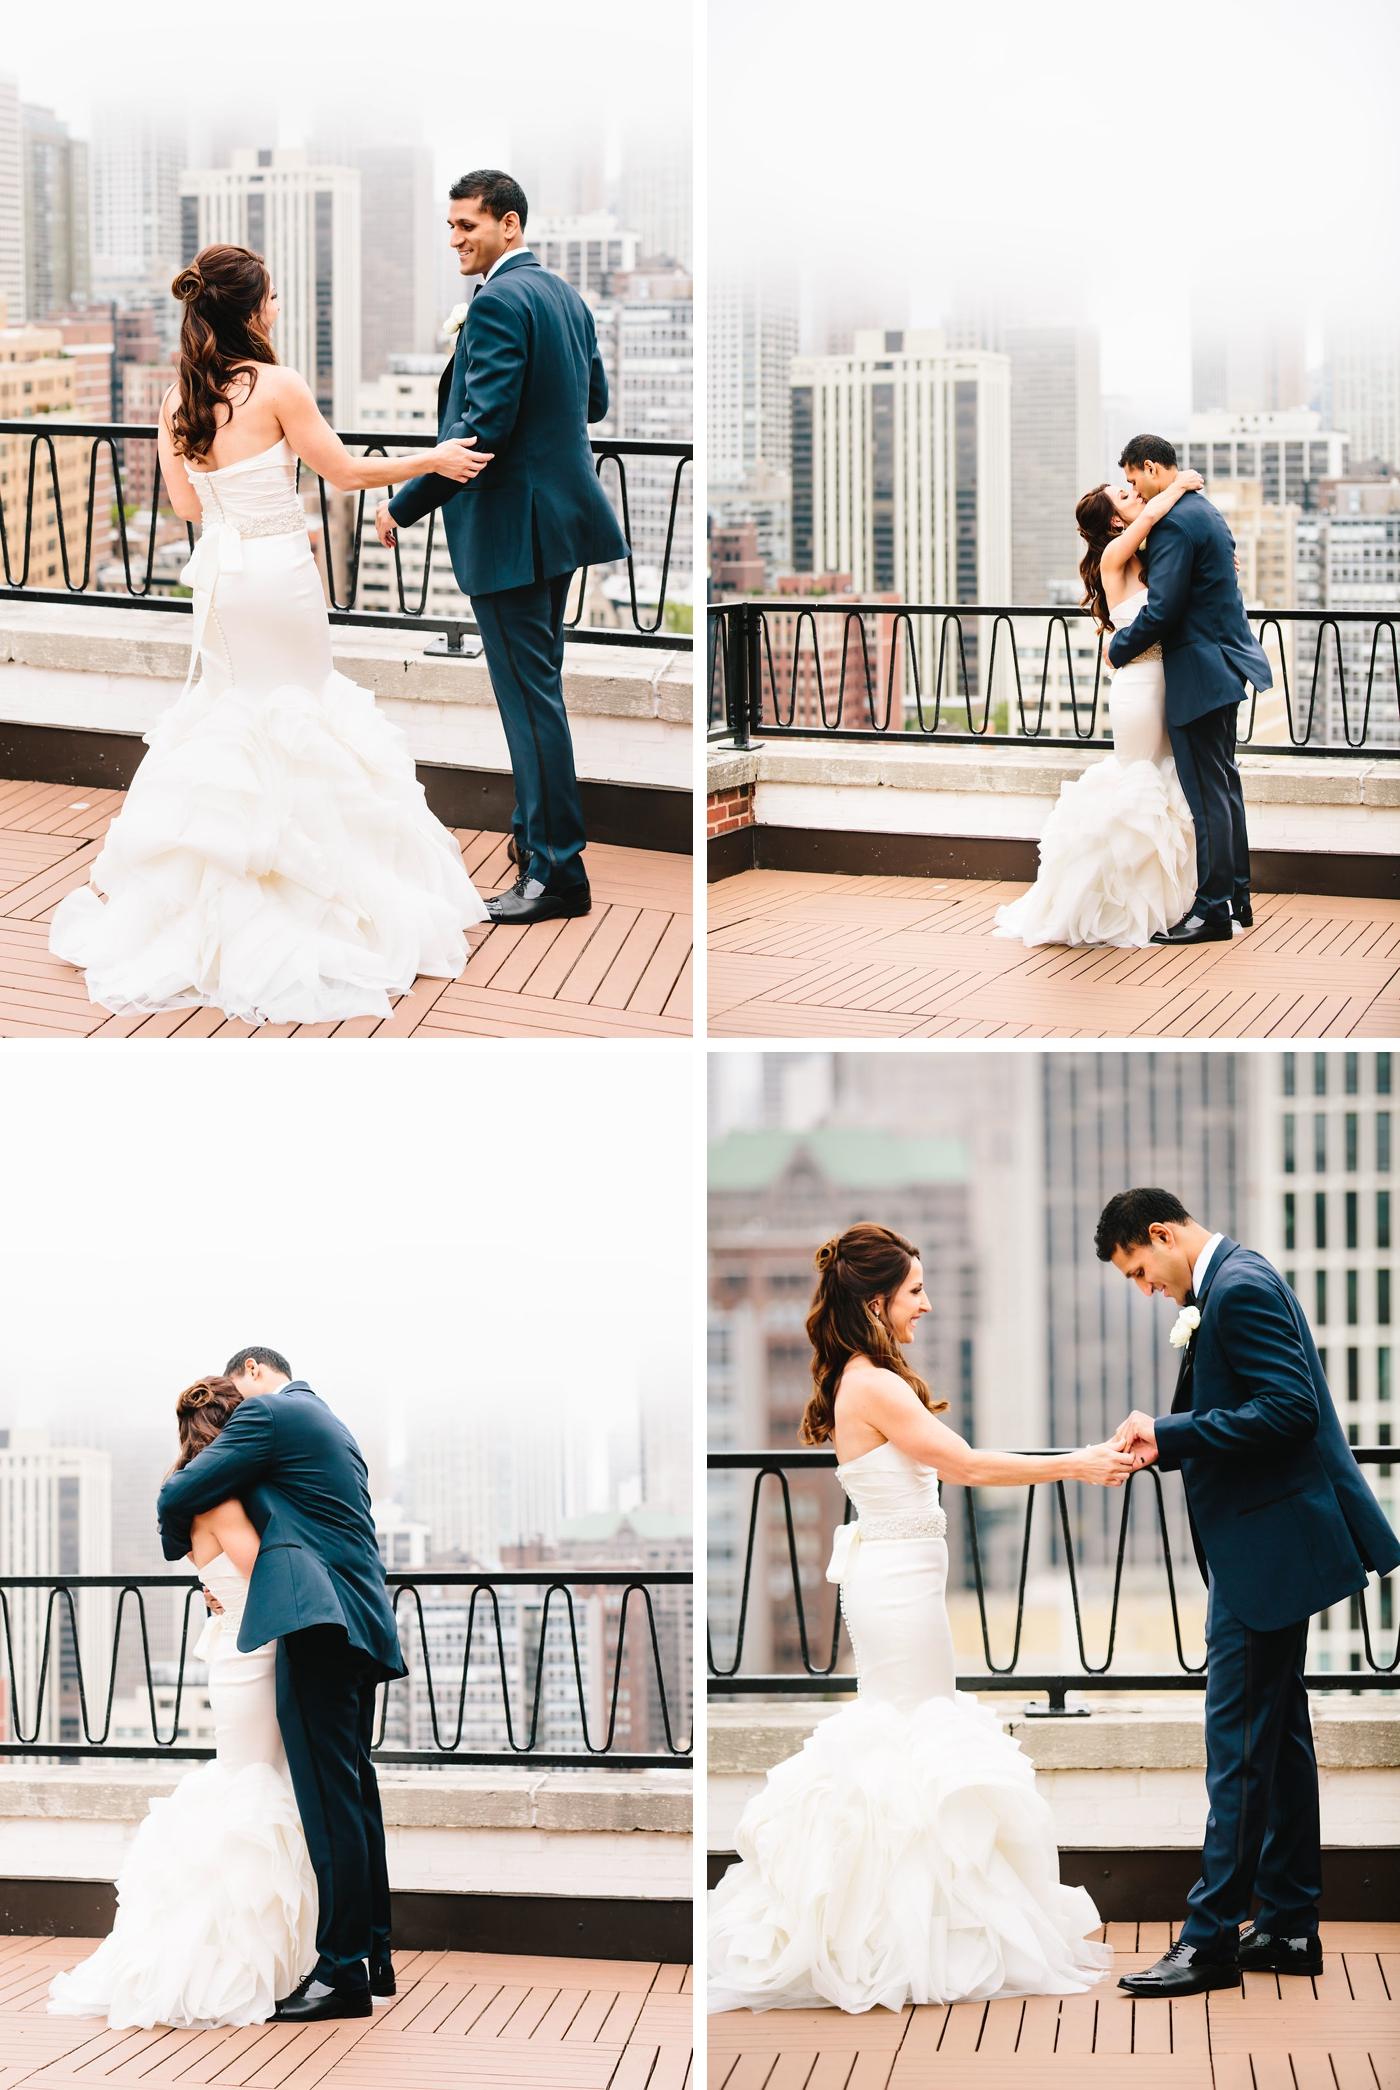 chicago-fine-art-wedding-photography-sakamuri19